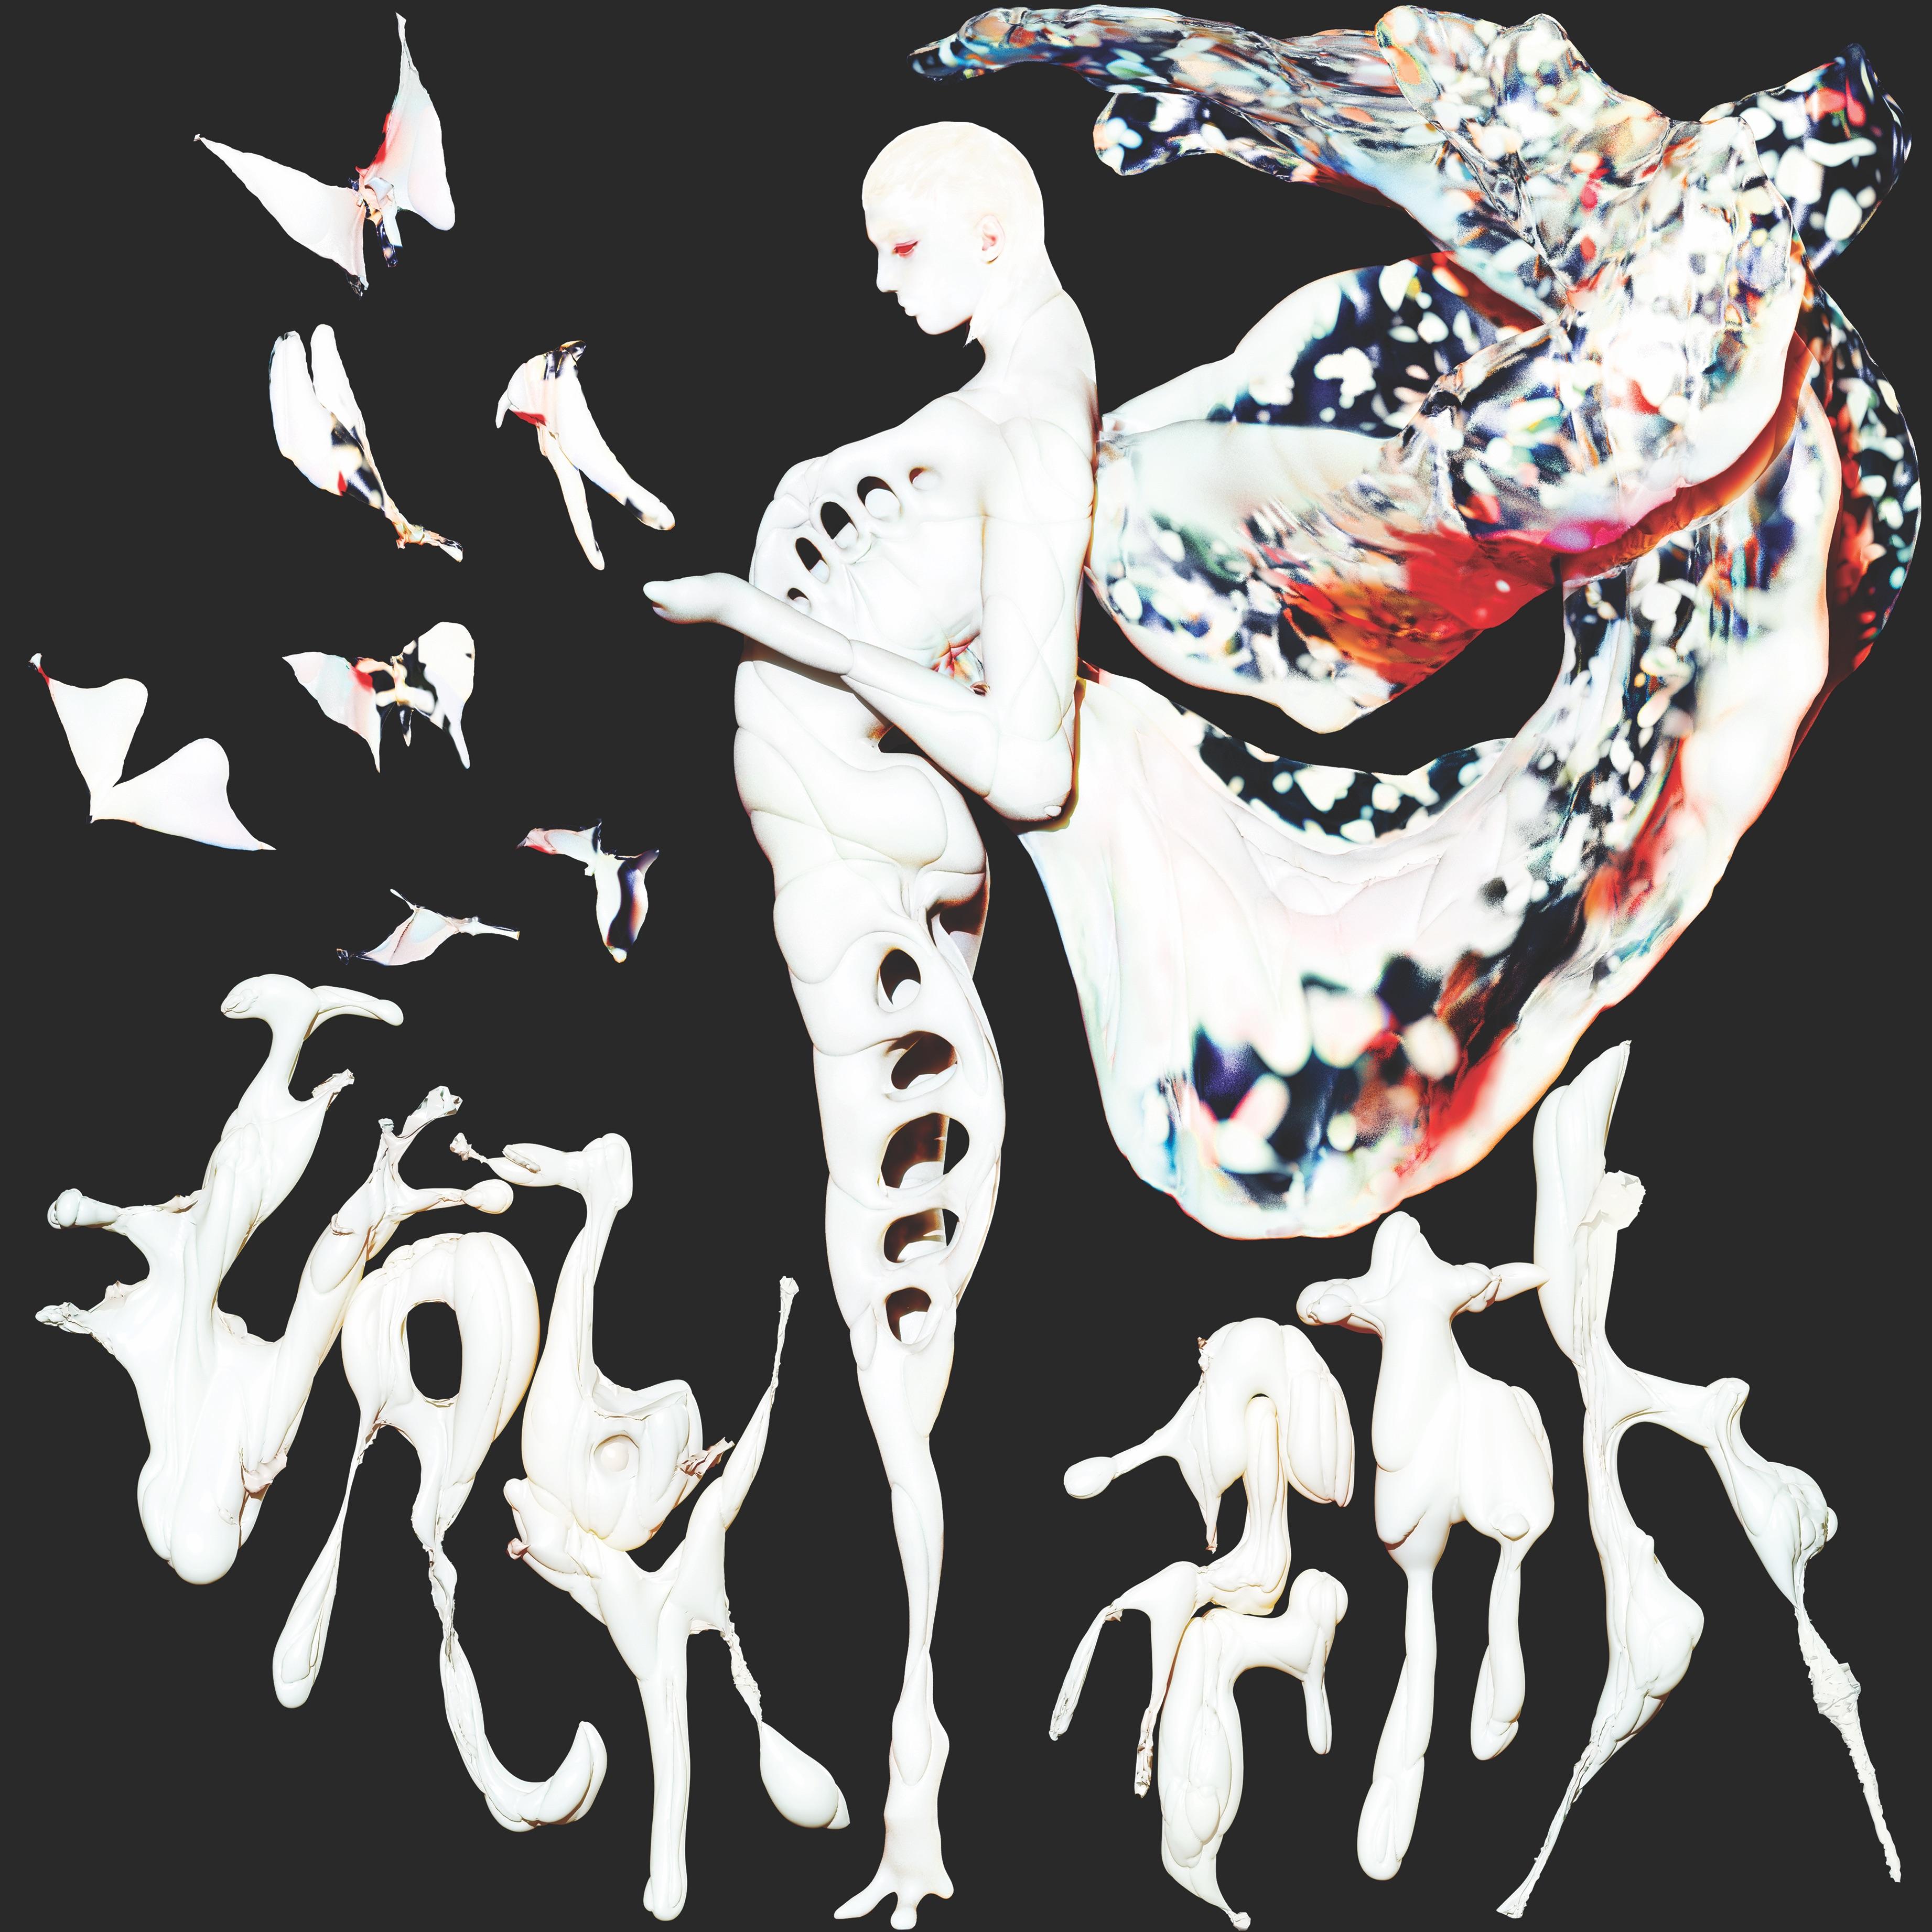 Doon Kanda - Labyrinth